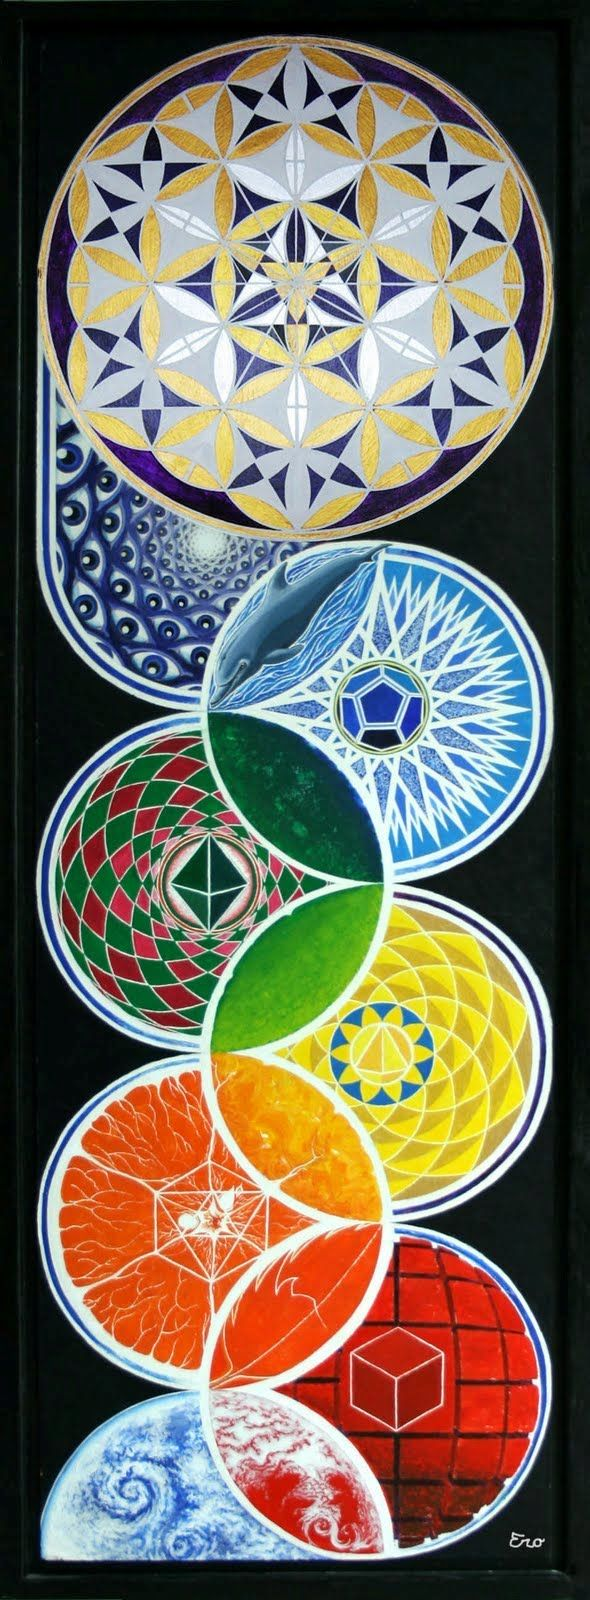 Sacred Geometry: Circles, Sacred Geometry Of Life, Flower Of Life, Spirituality Growth, Chakra Yoga Spirituality H, Rainbows Bridges, Art Flower, Sacred Geometry Art, Mandalas